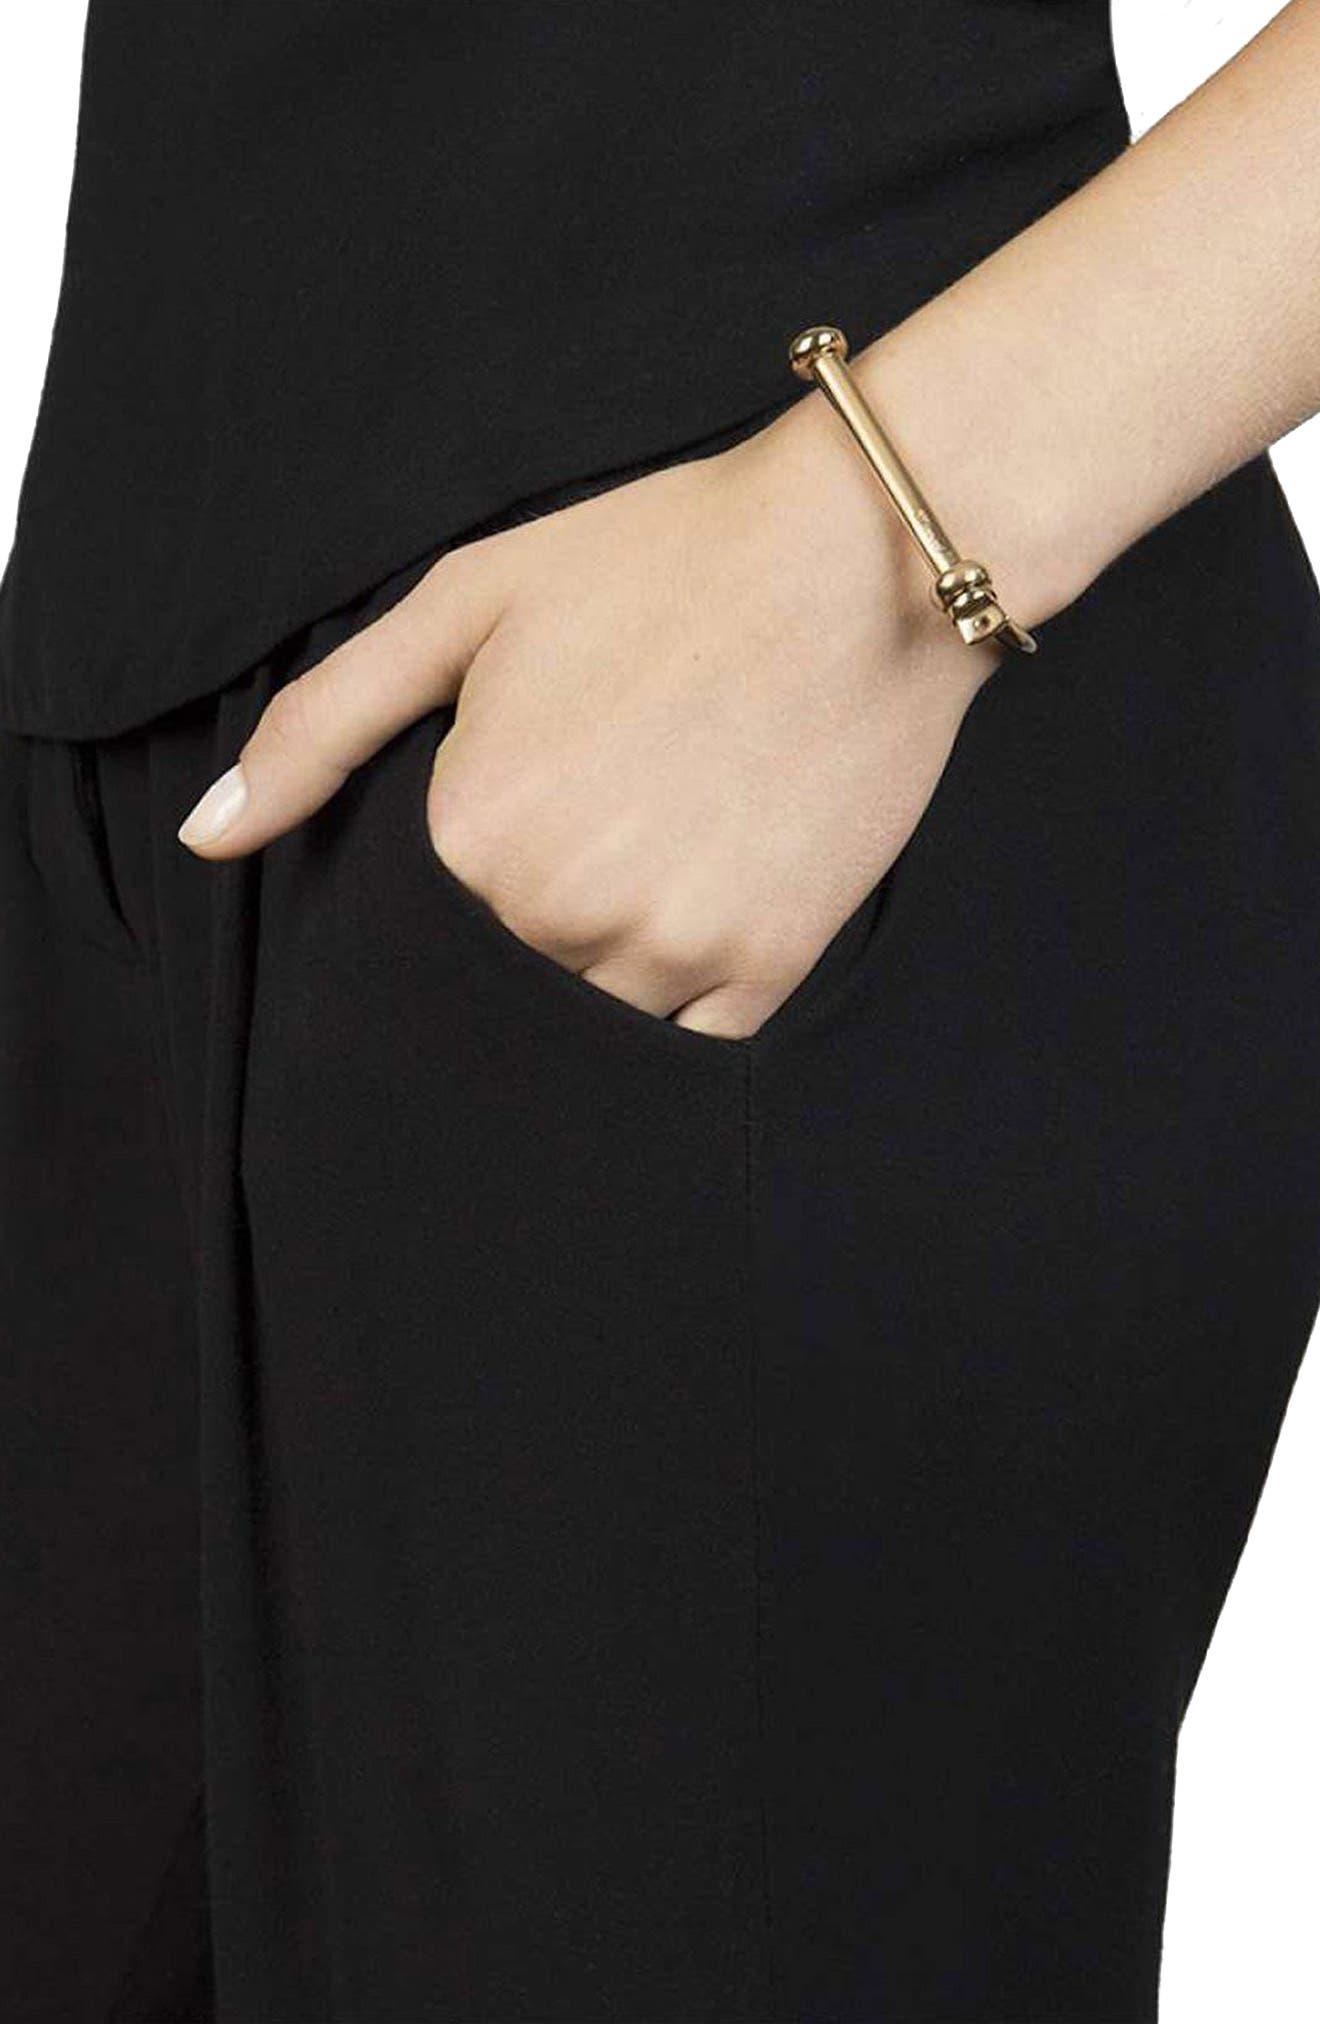 Screw Cuff Bracelet,                             Alternate thumbnail 2, color,                             710